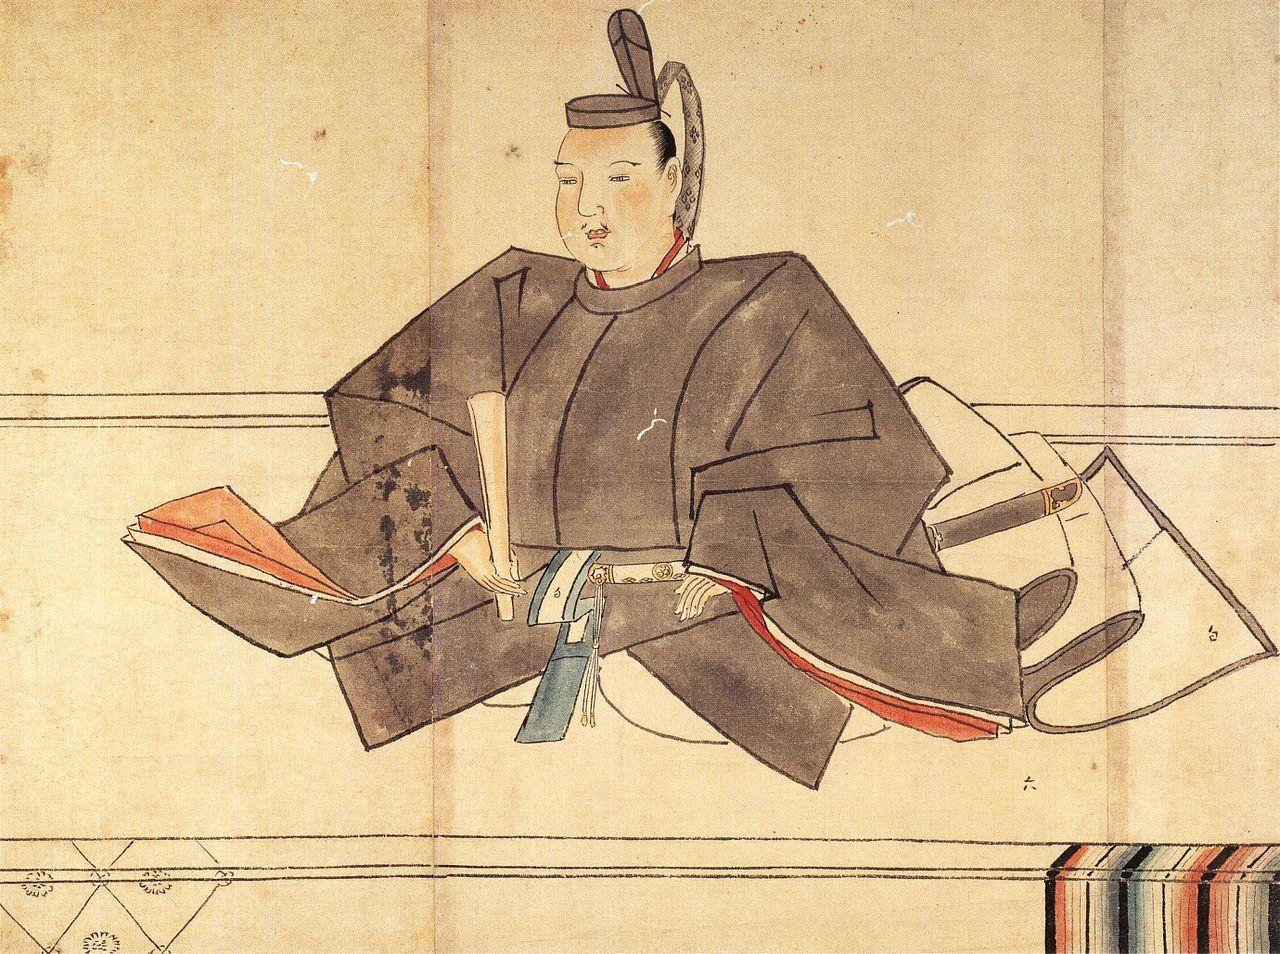 1280px-Tokugawa_Ienobu.jpg